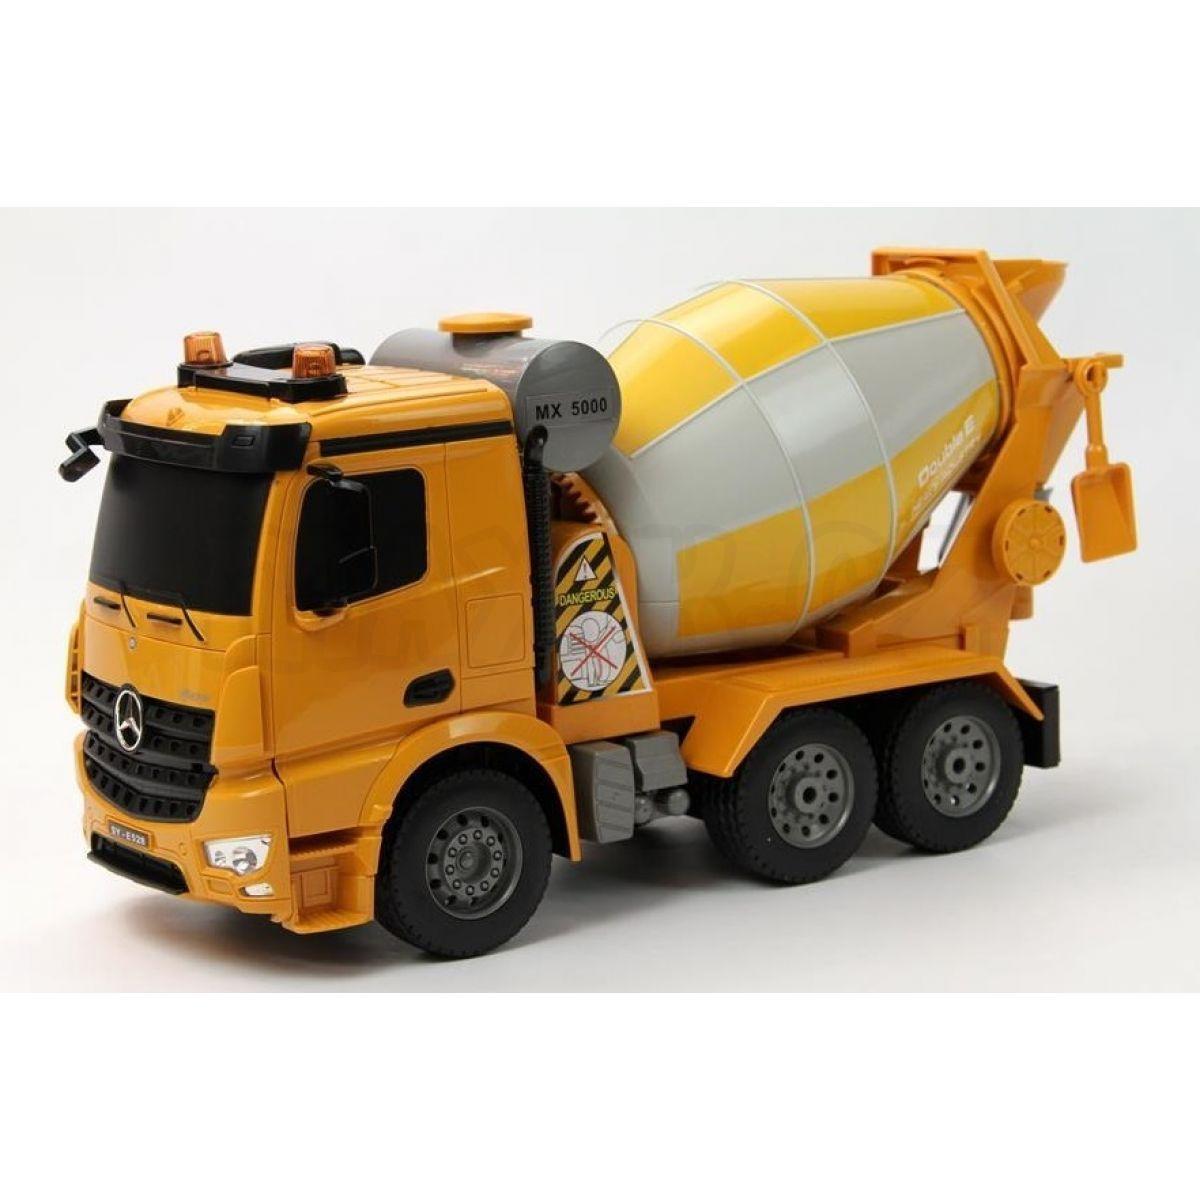 Rc mercedes benz arocs cement mixer 1 20 max kovy hra ky for Rc mercedes benz